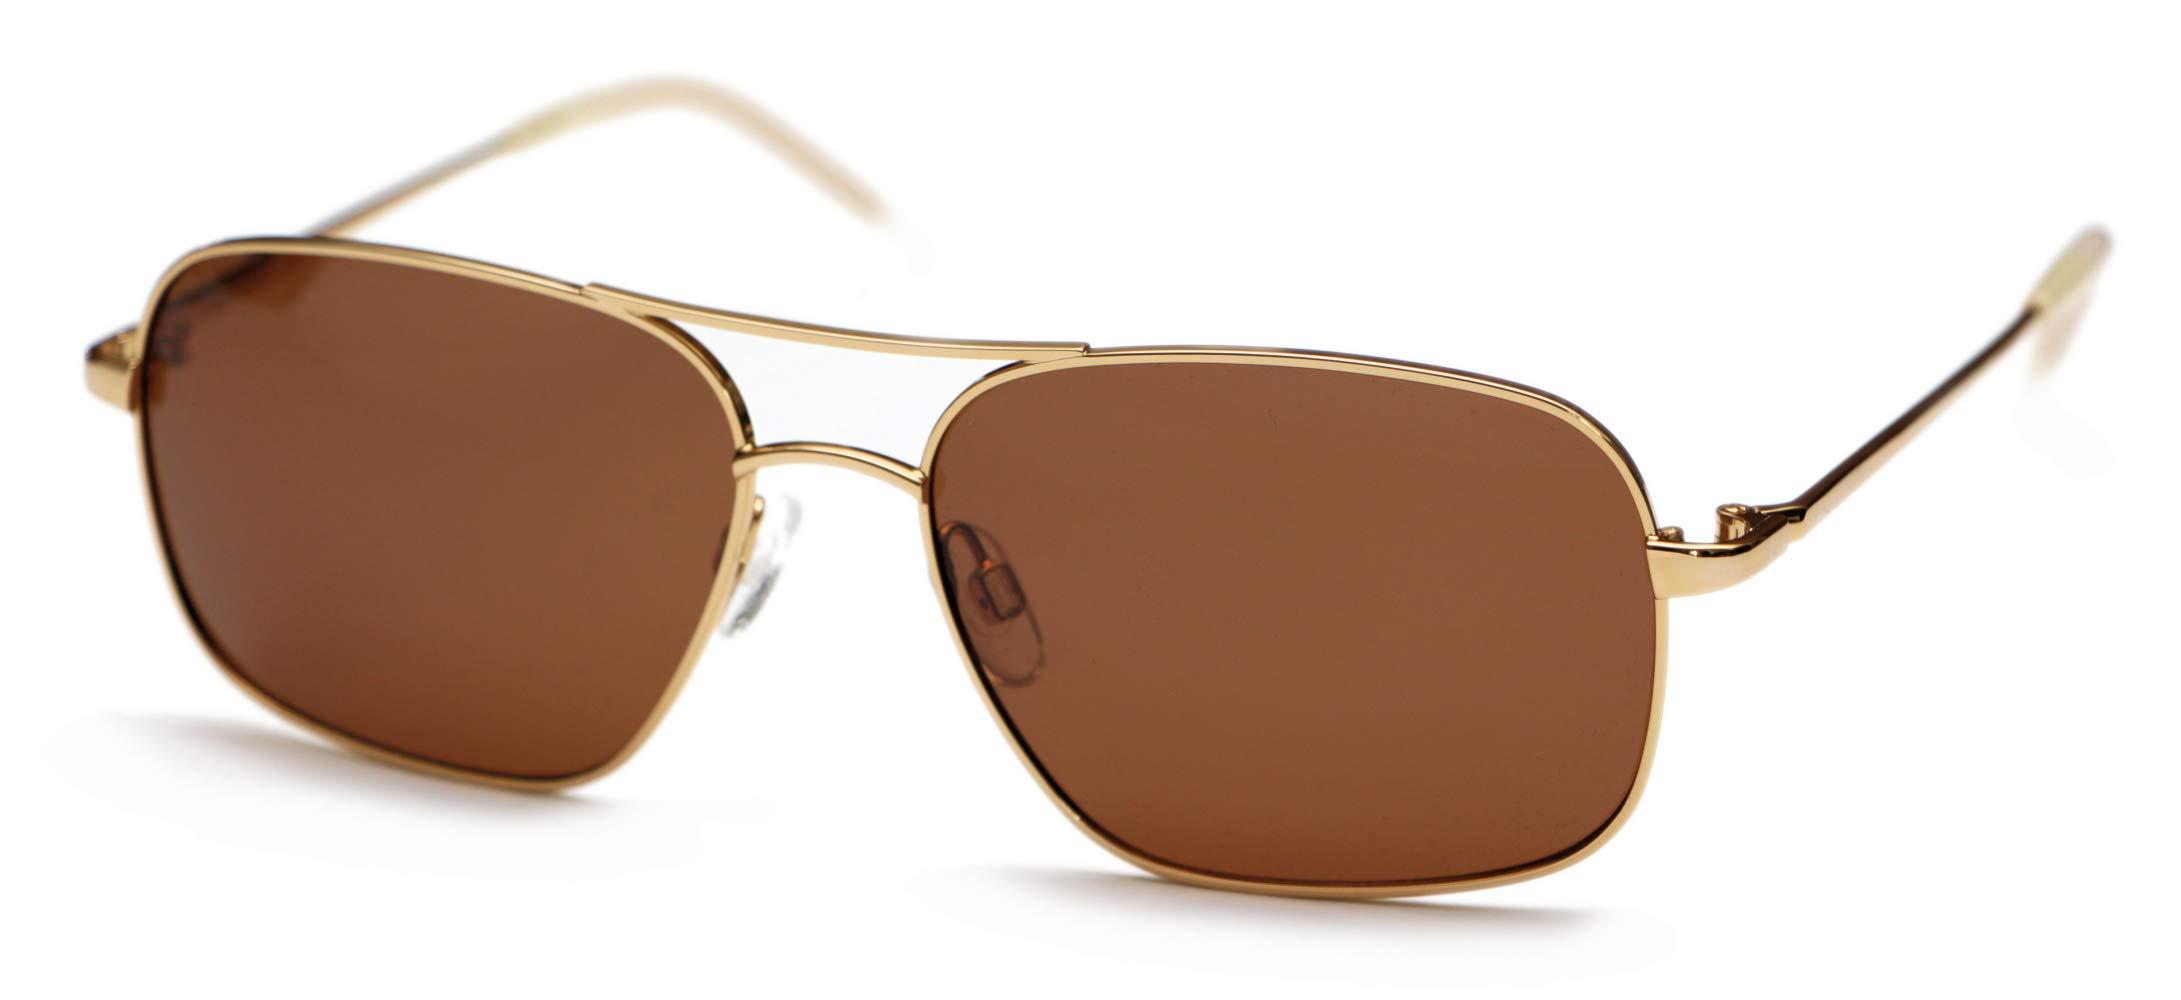 Magnoli Clothiers Blacklist Reddington Sunglasses